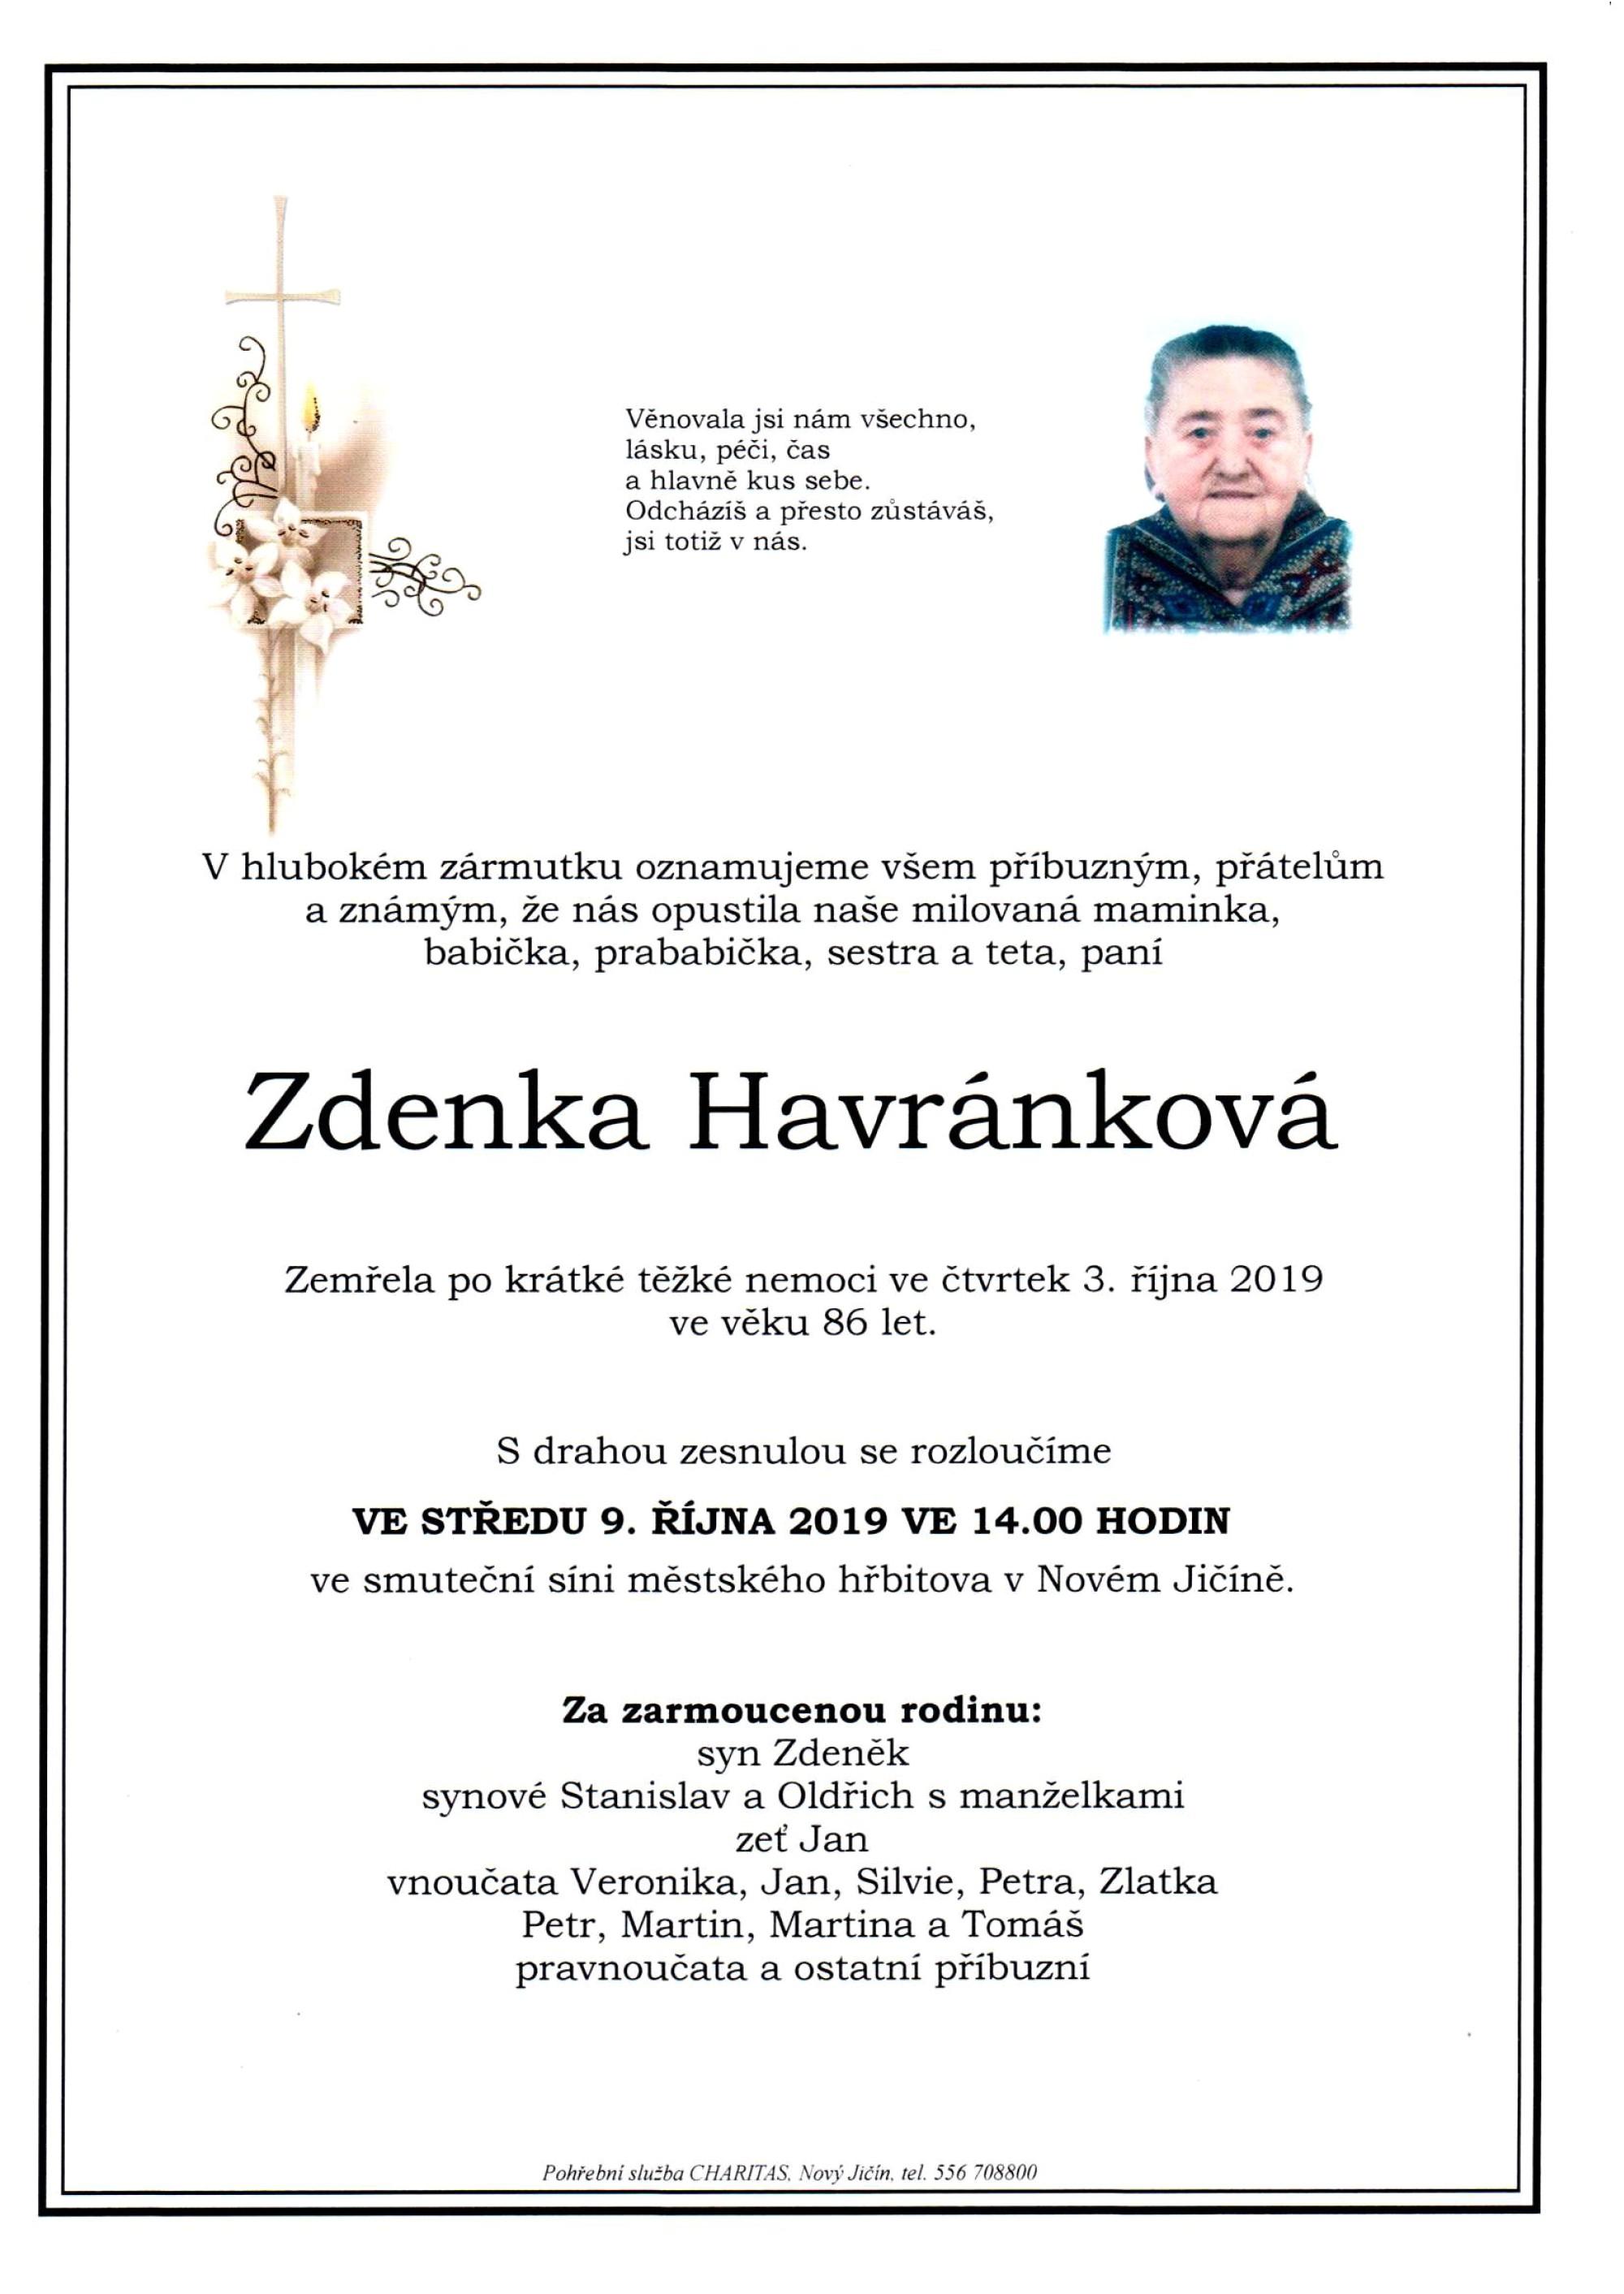 Zdenka Havránková